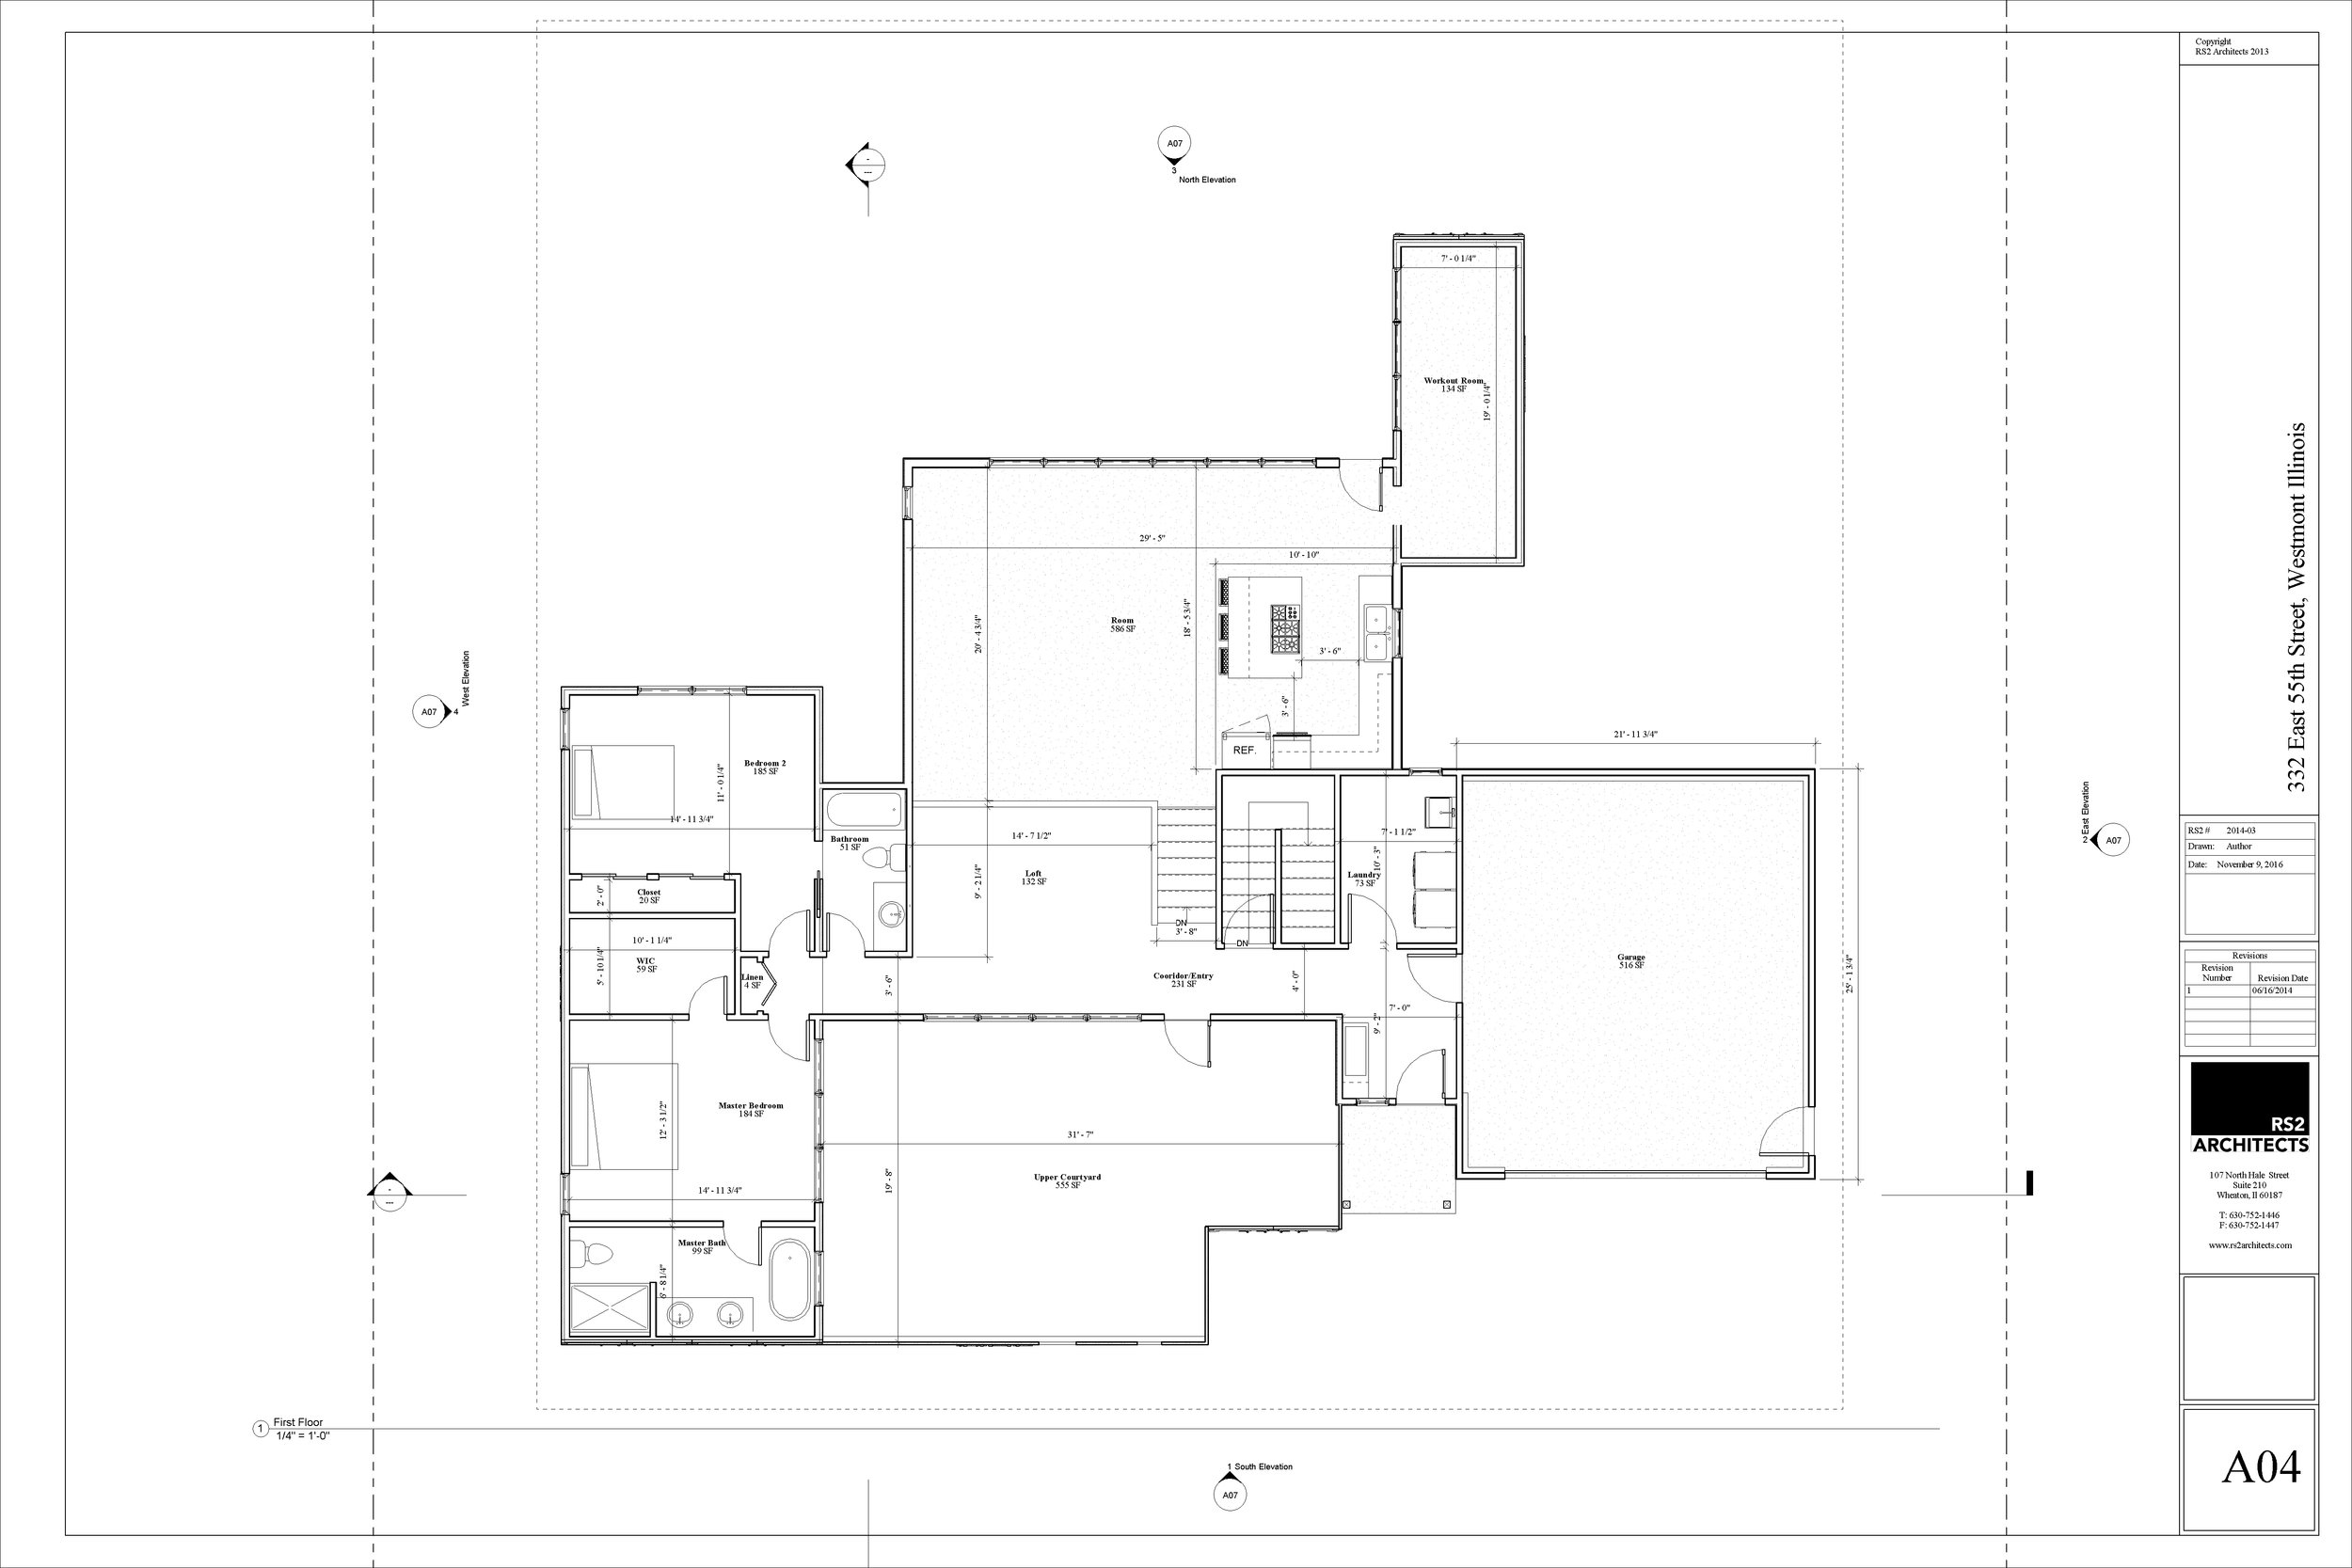 Knapik floor plan 02.jpg